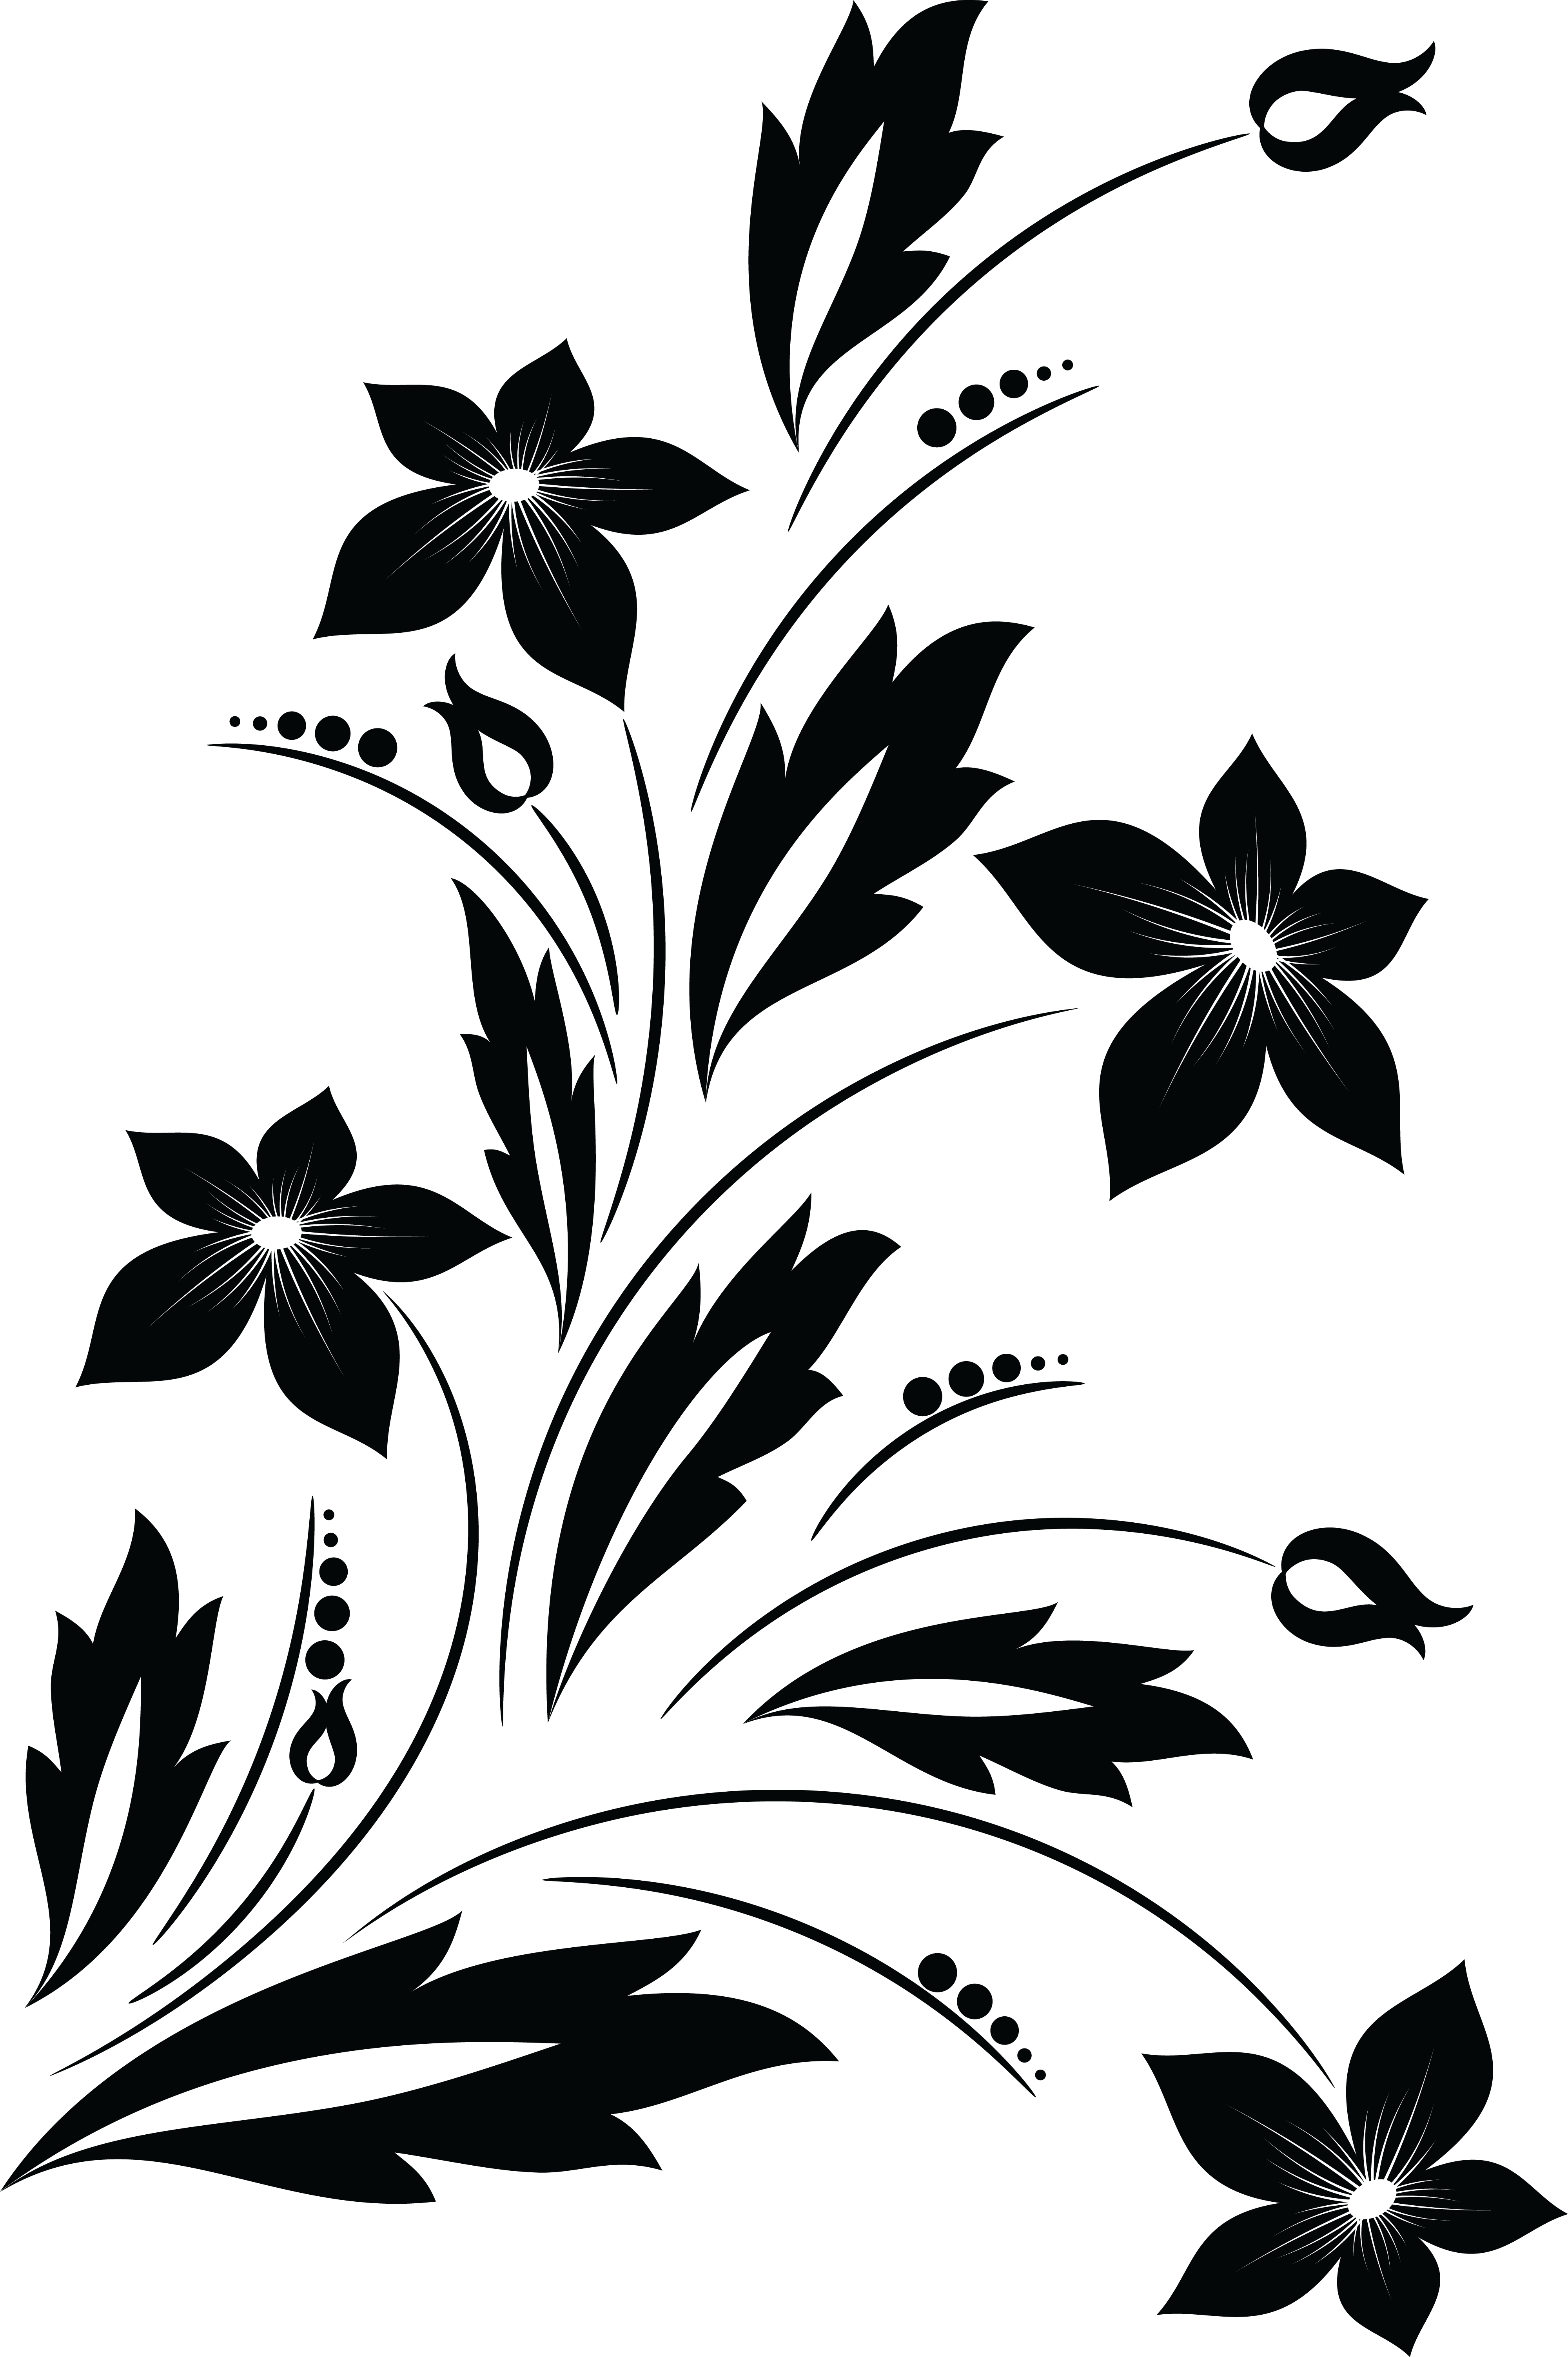 4000x6012 Drawn Vine Flower Png